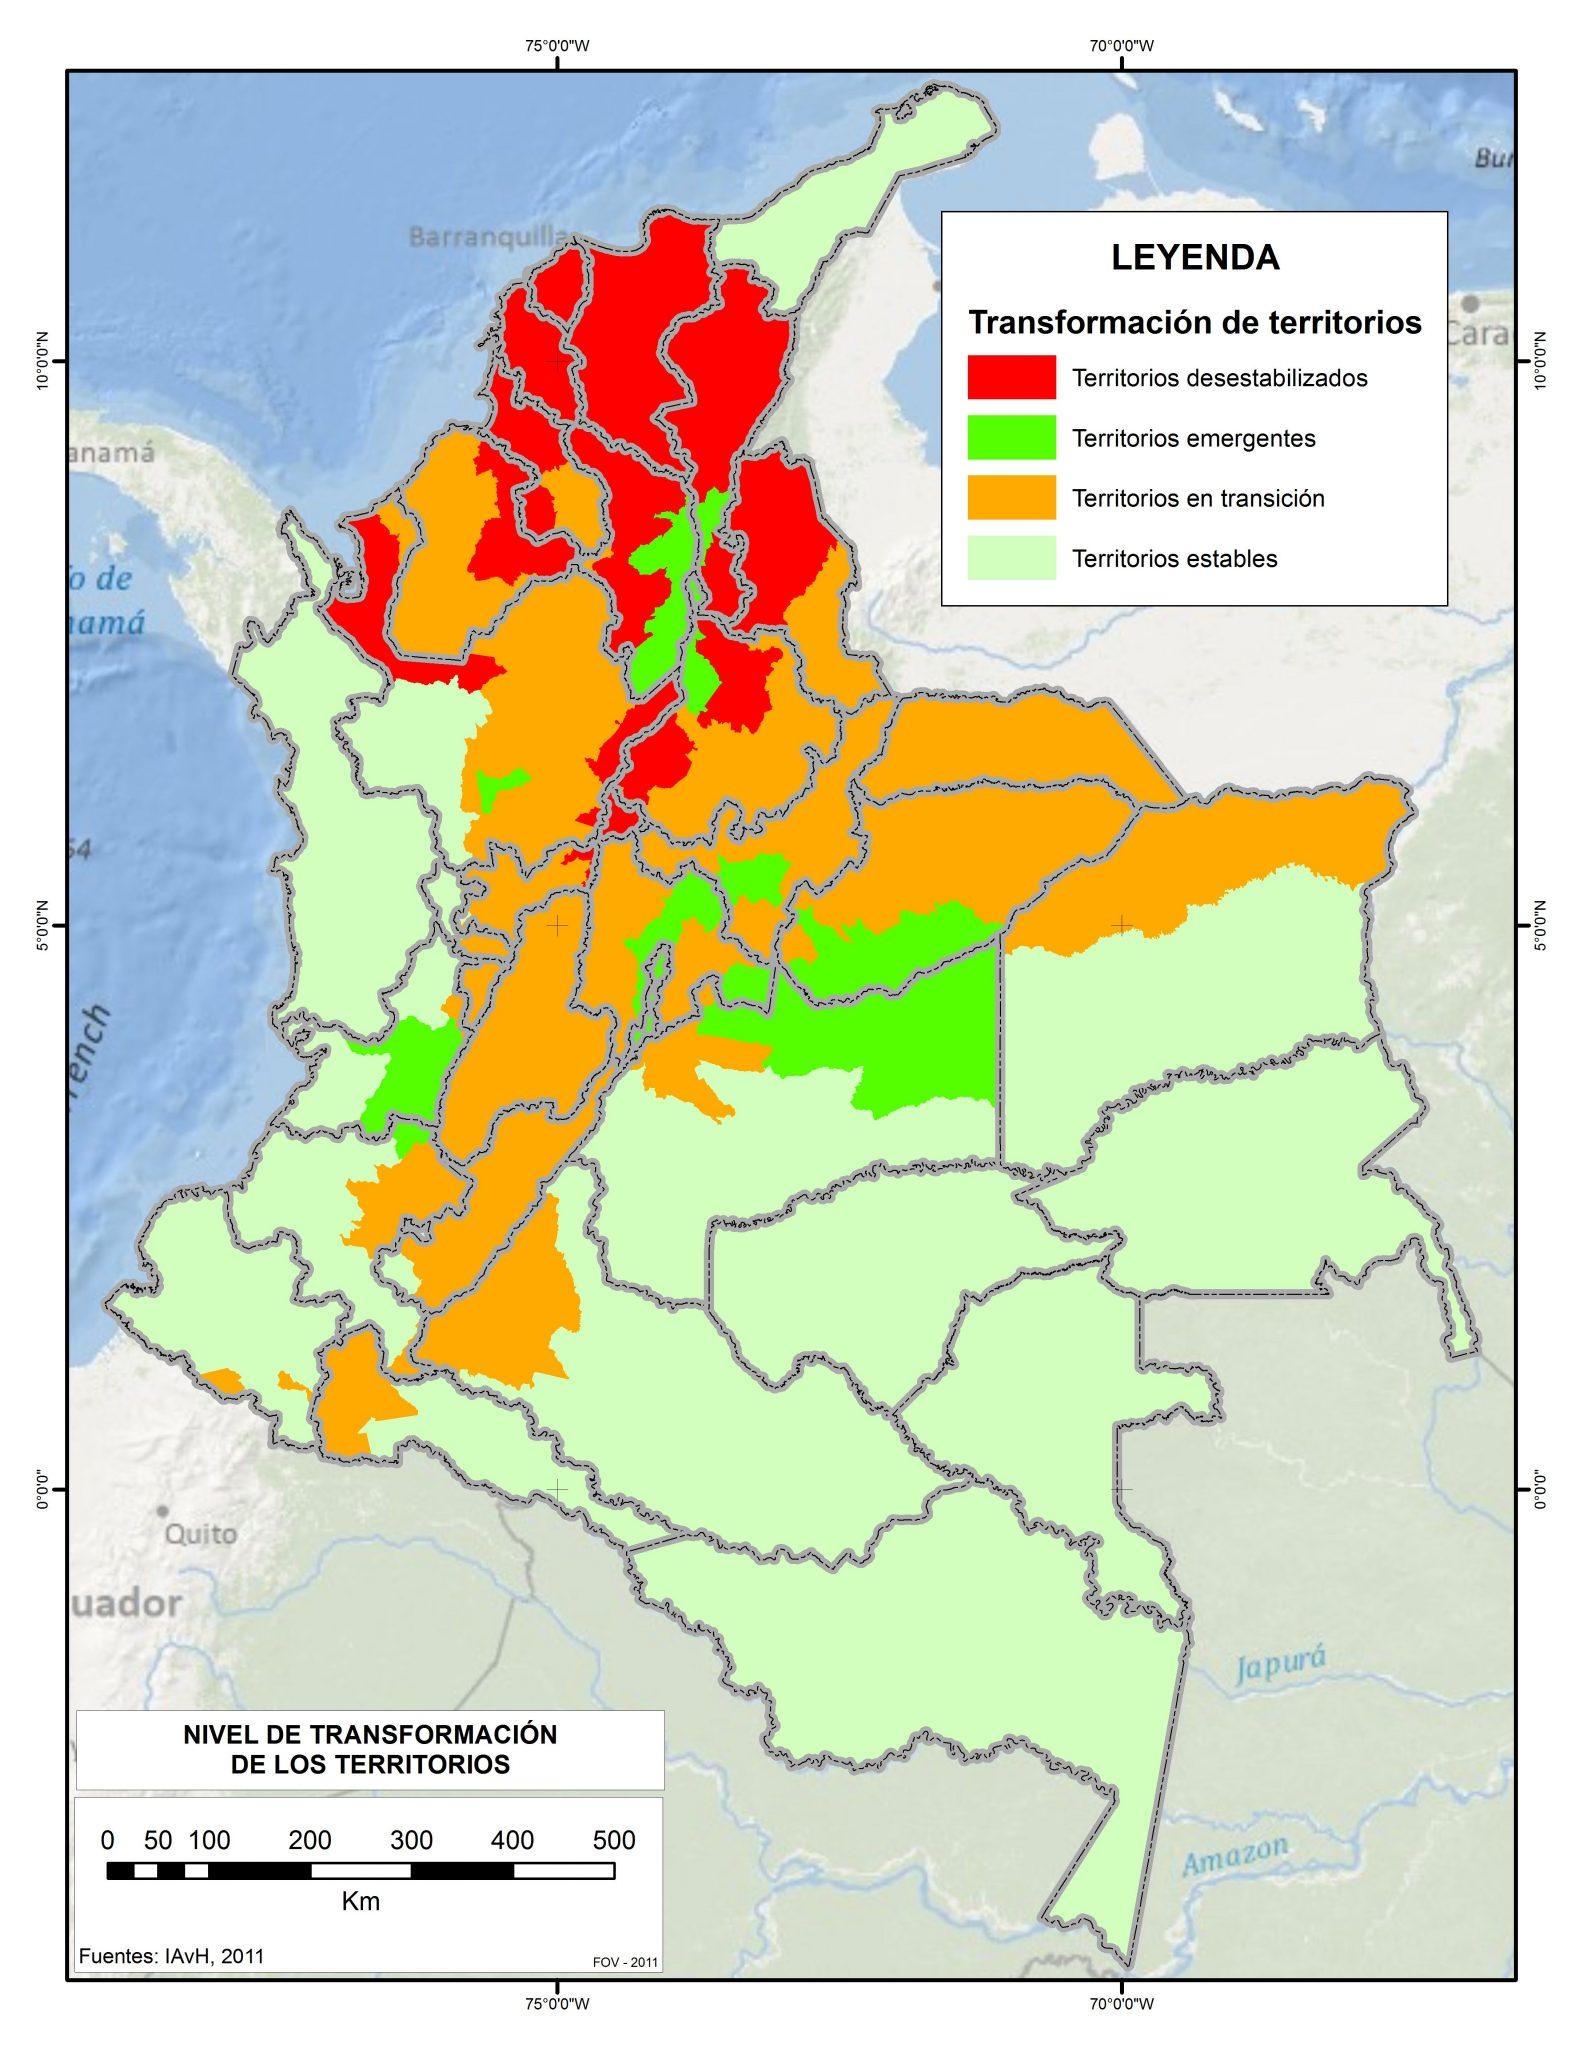 Ecosystem Transformation. Source: Instituto Humboldt 2011